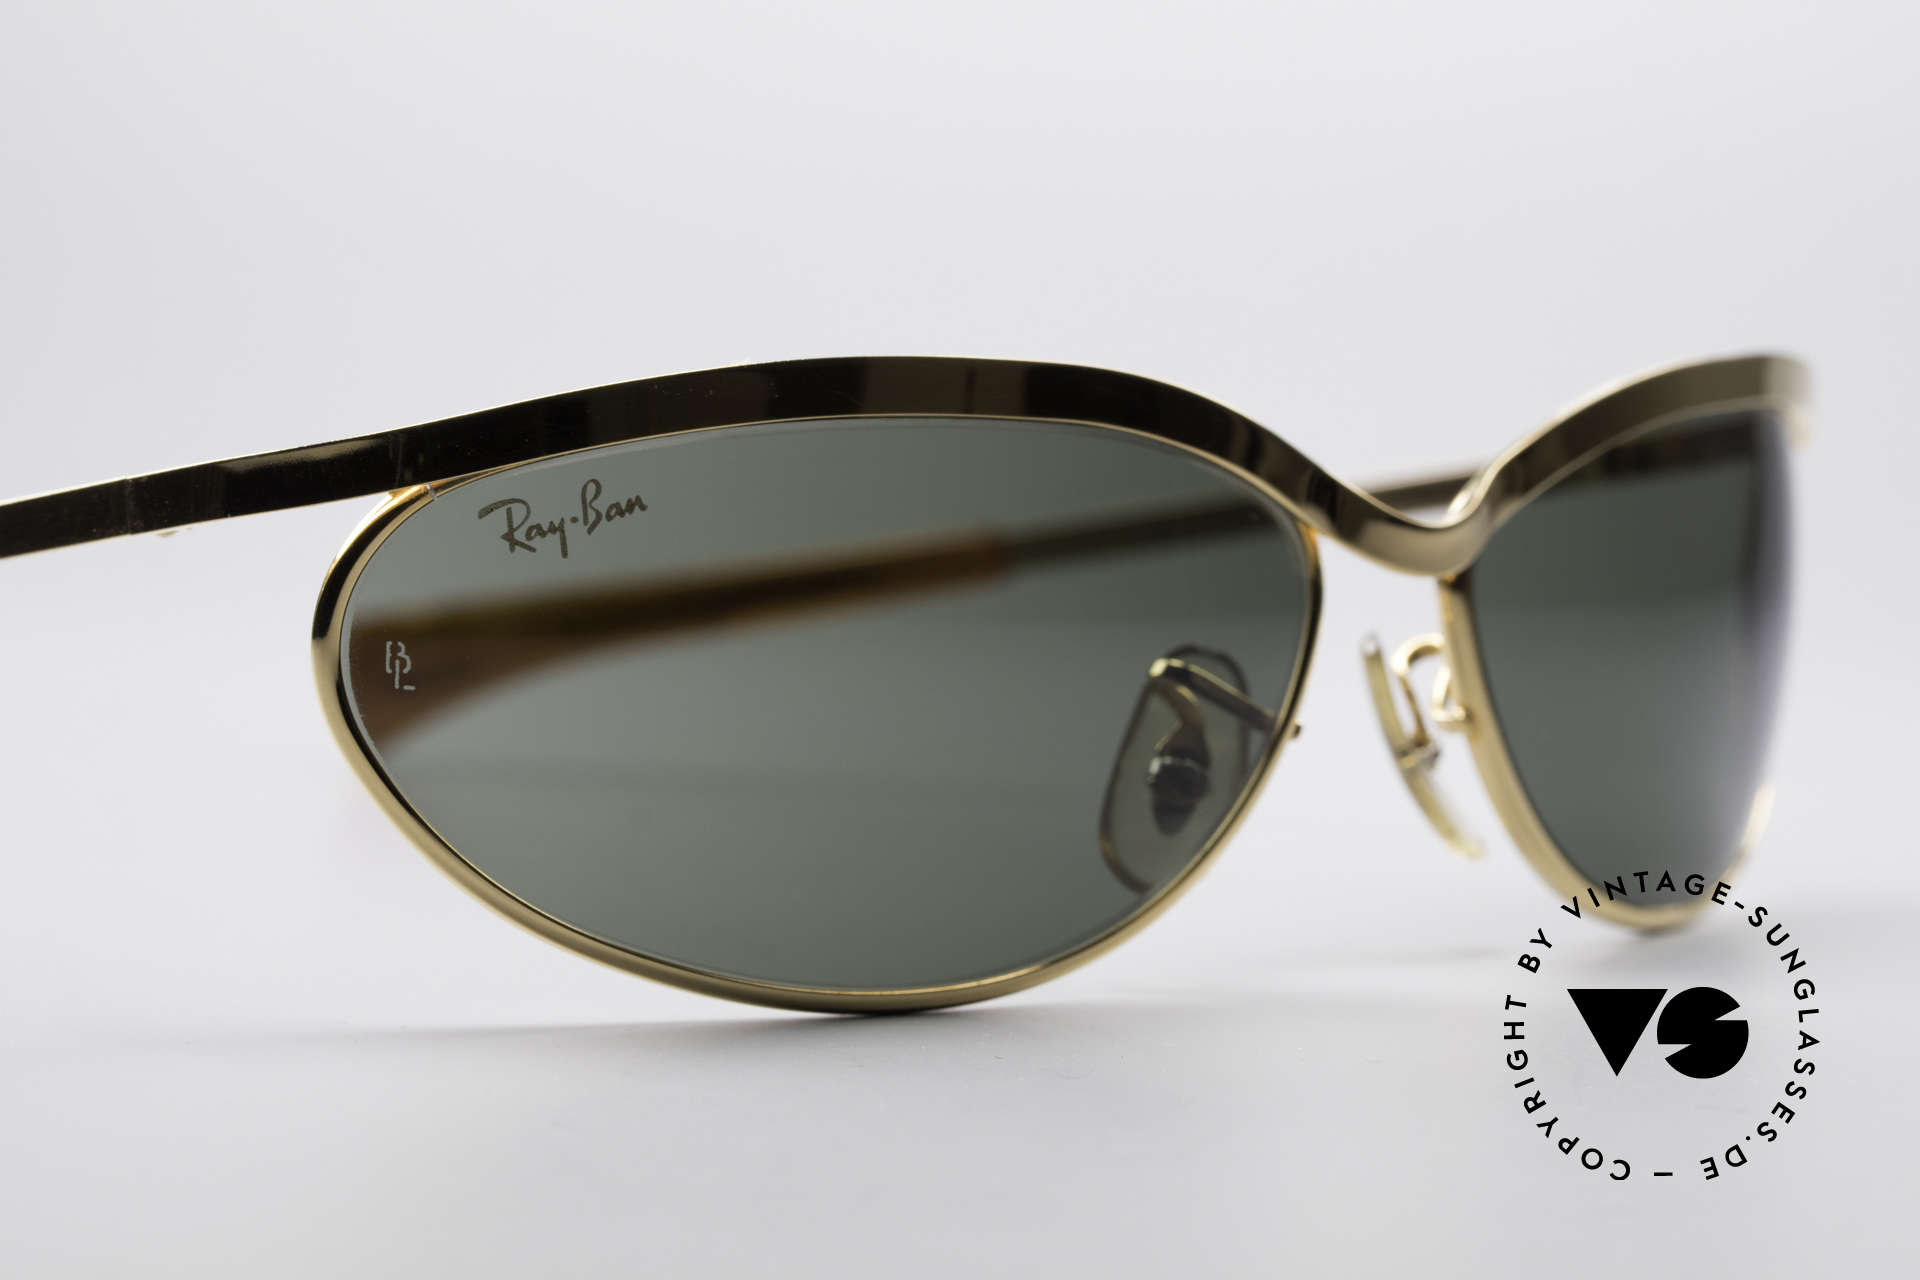 d6326f49f4c Sunglasses Ray Ban Olympian V Deluxe B L USA Vintage Sunglasses ...